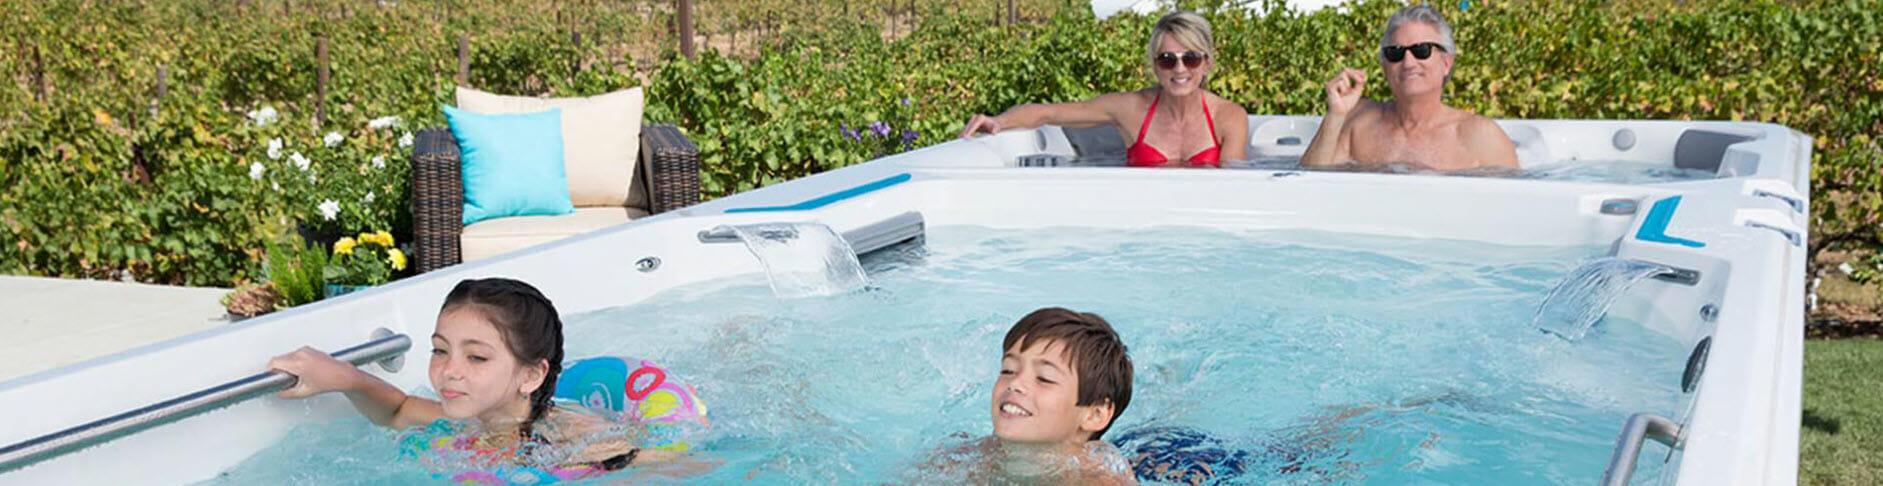 3 Reasons to Love the Amazing Lap Pool, Swim Spas Madison